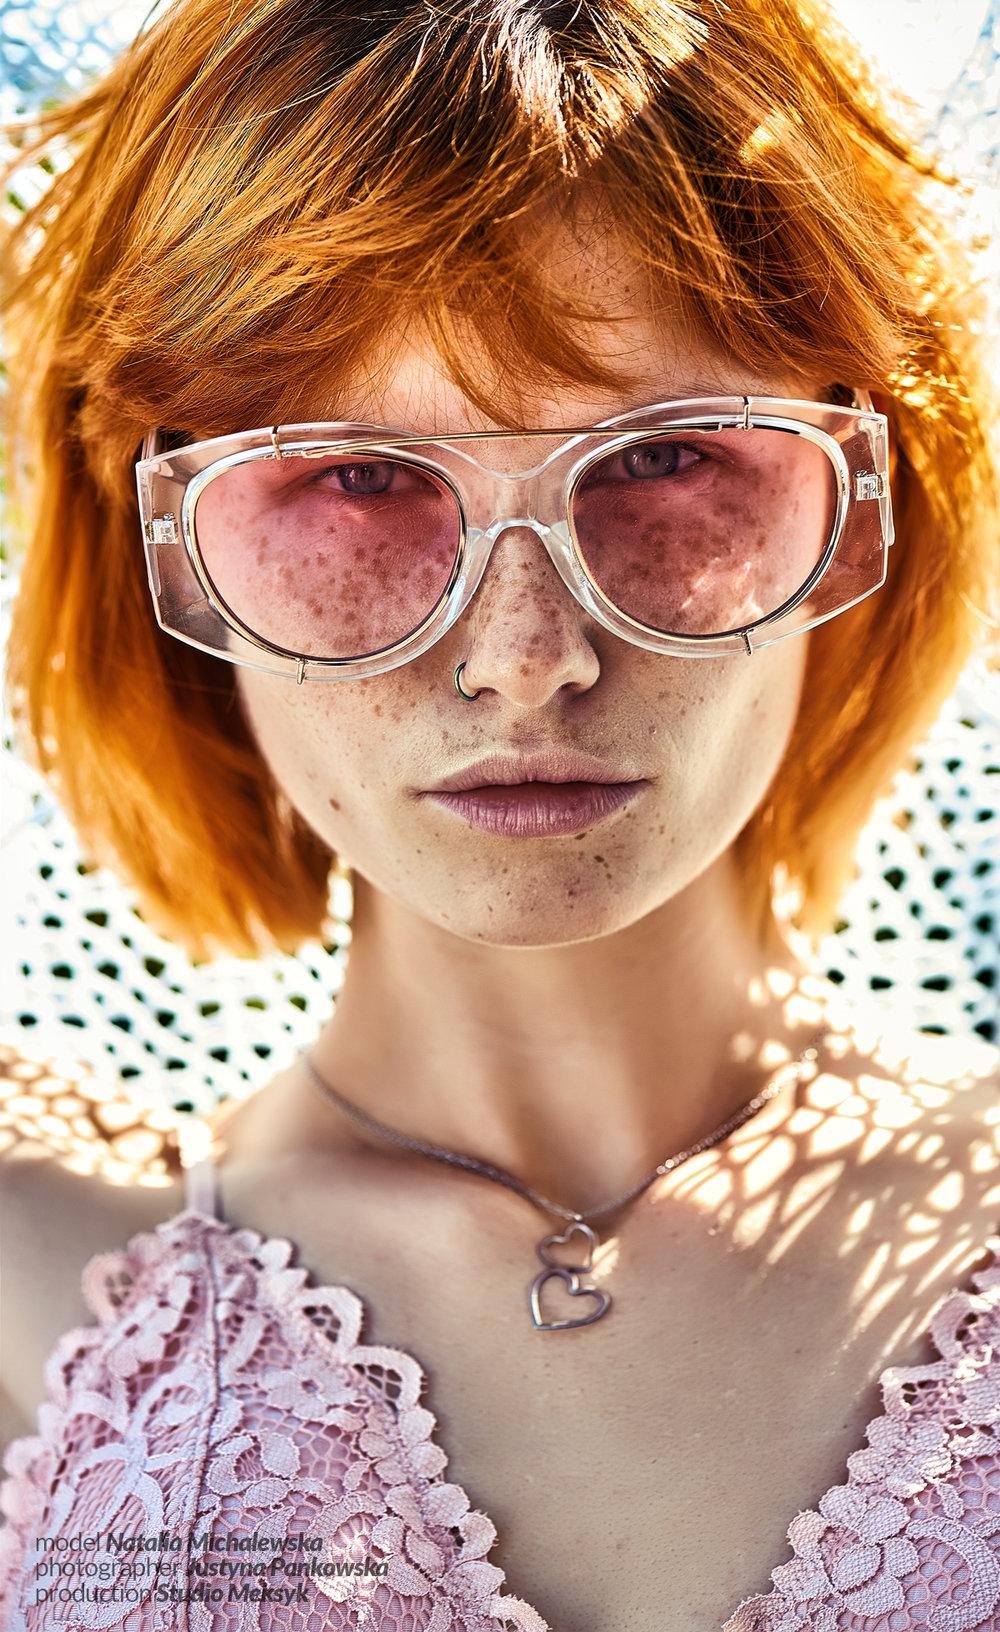 Natalia Michalewska, beauty, girl, freckles, natural, portrait, summer, glasses, pro, retouch, photography, D4s, nikkor 105 macro, Justyna Pankowska, Studio Meksyk 1.jpg